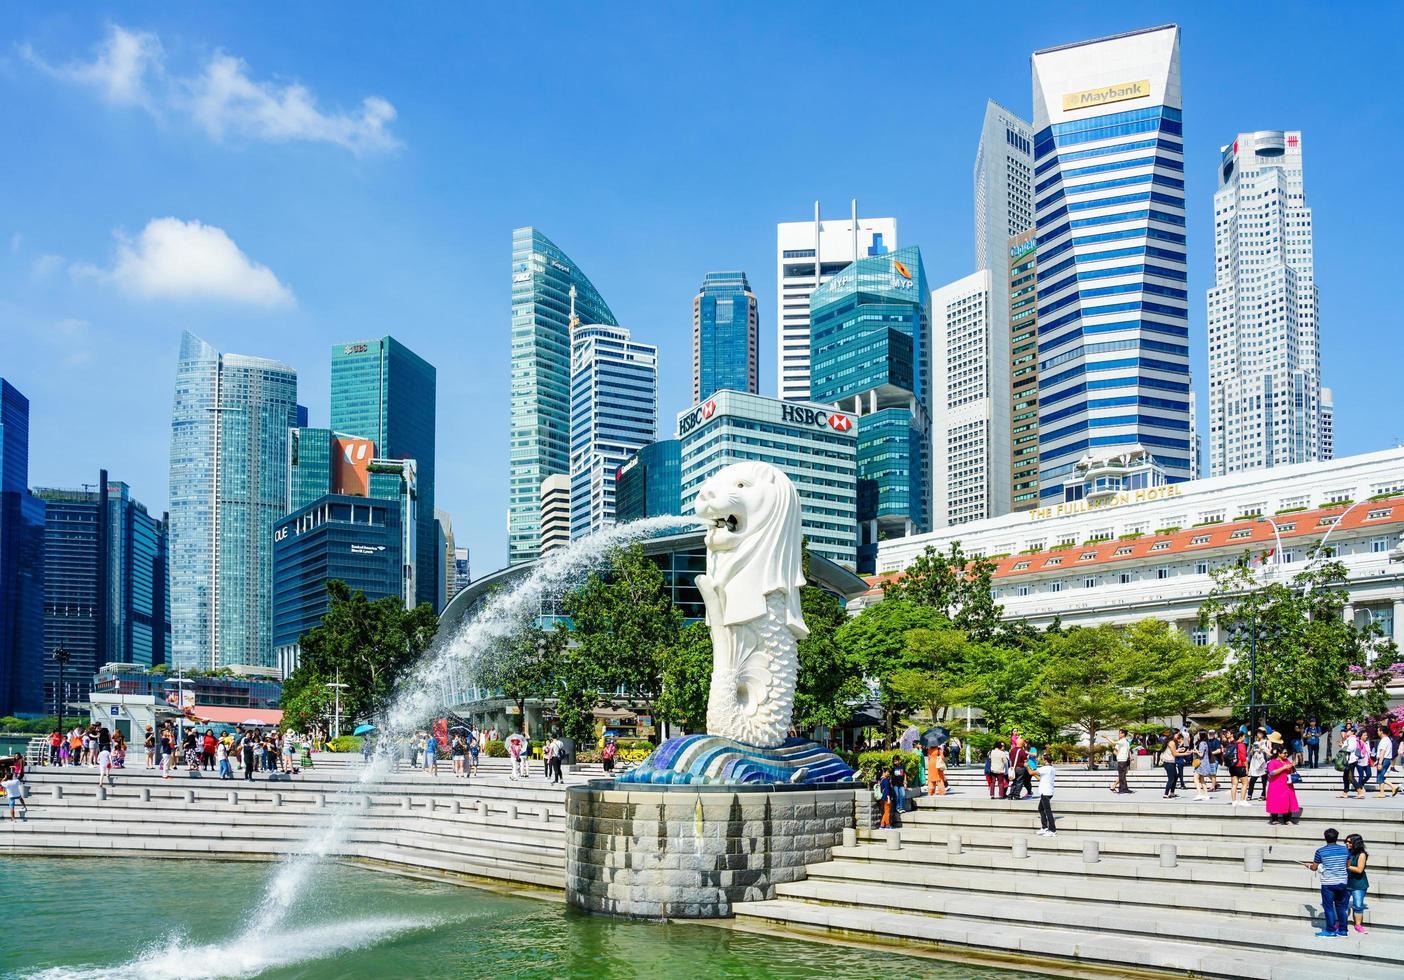 Fuente de la estatua de Merlion en Merlion Park en Singapur, 2018 foto